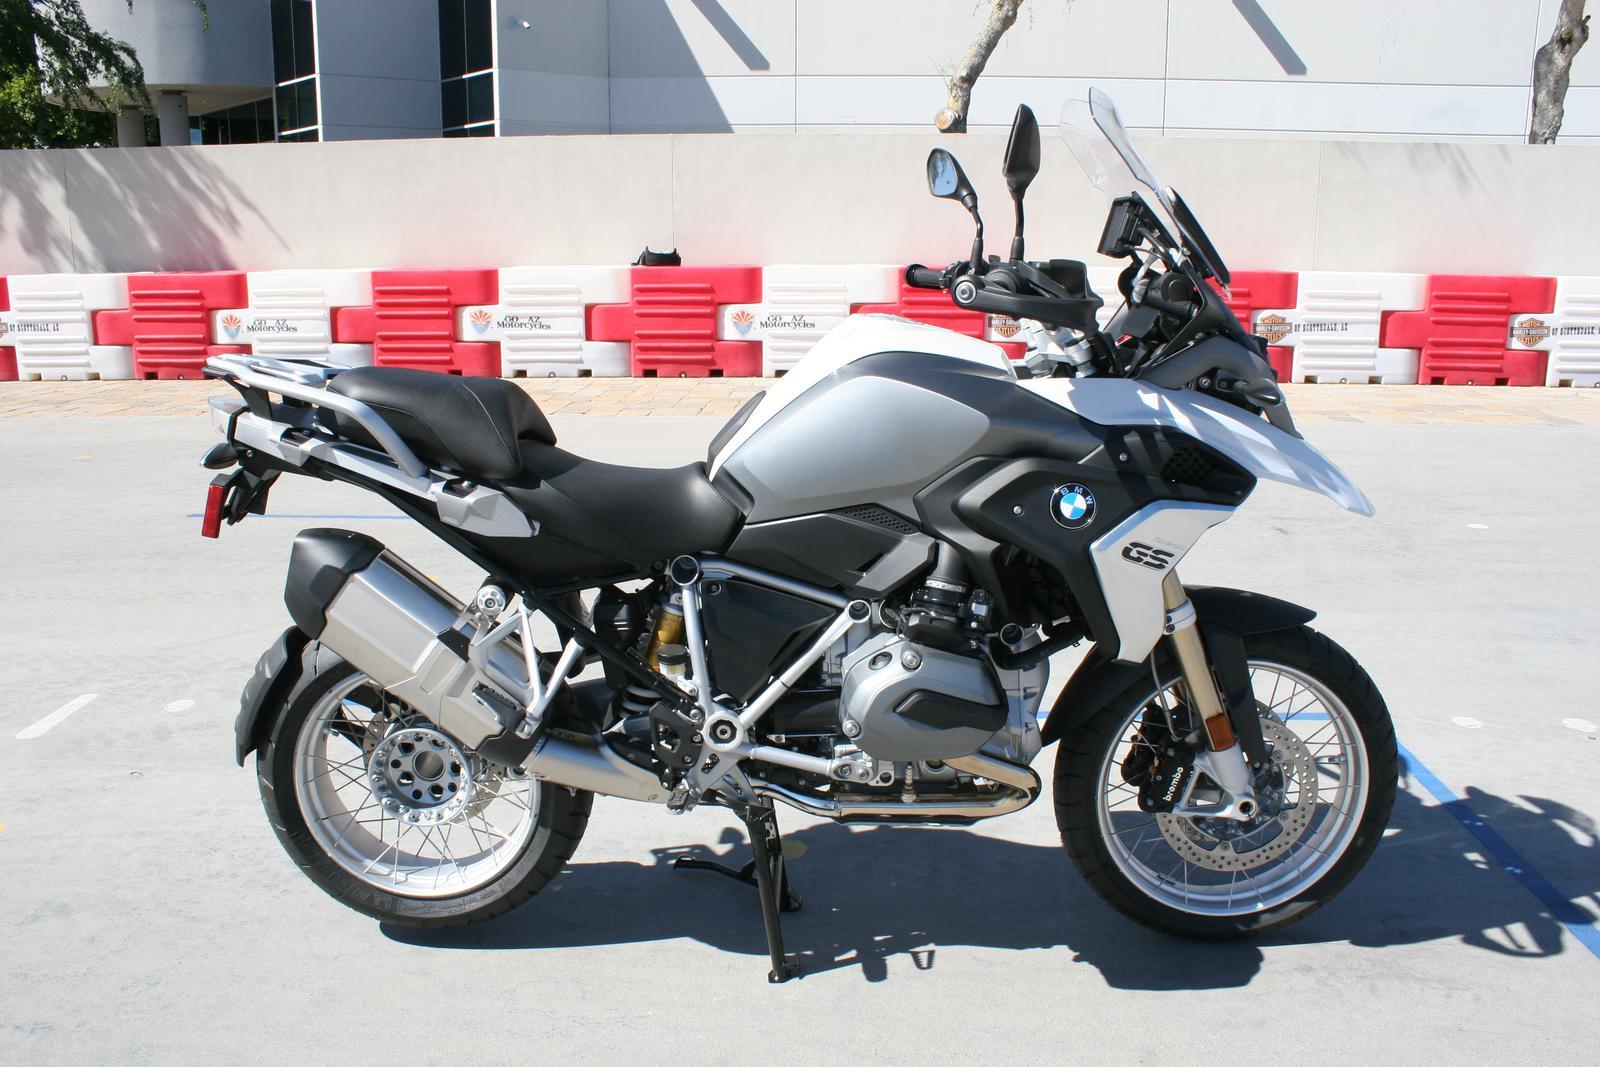 2018 Bmw R 1200 Gs For Sale In Scottsdale Az Go Az Motorcycles In